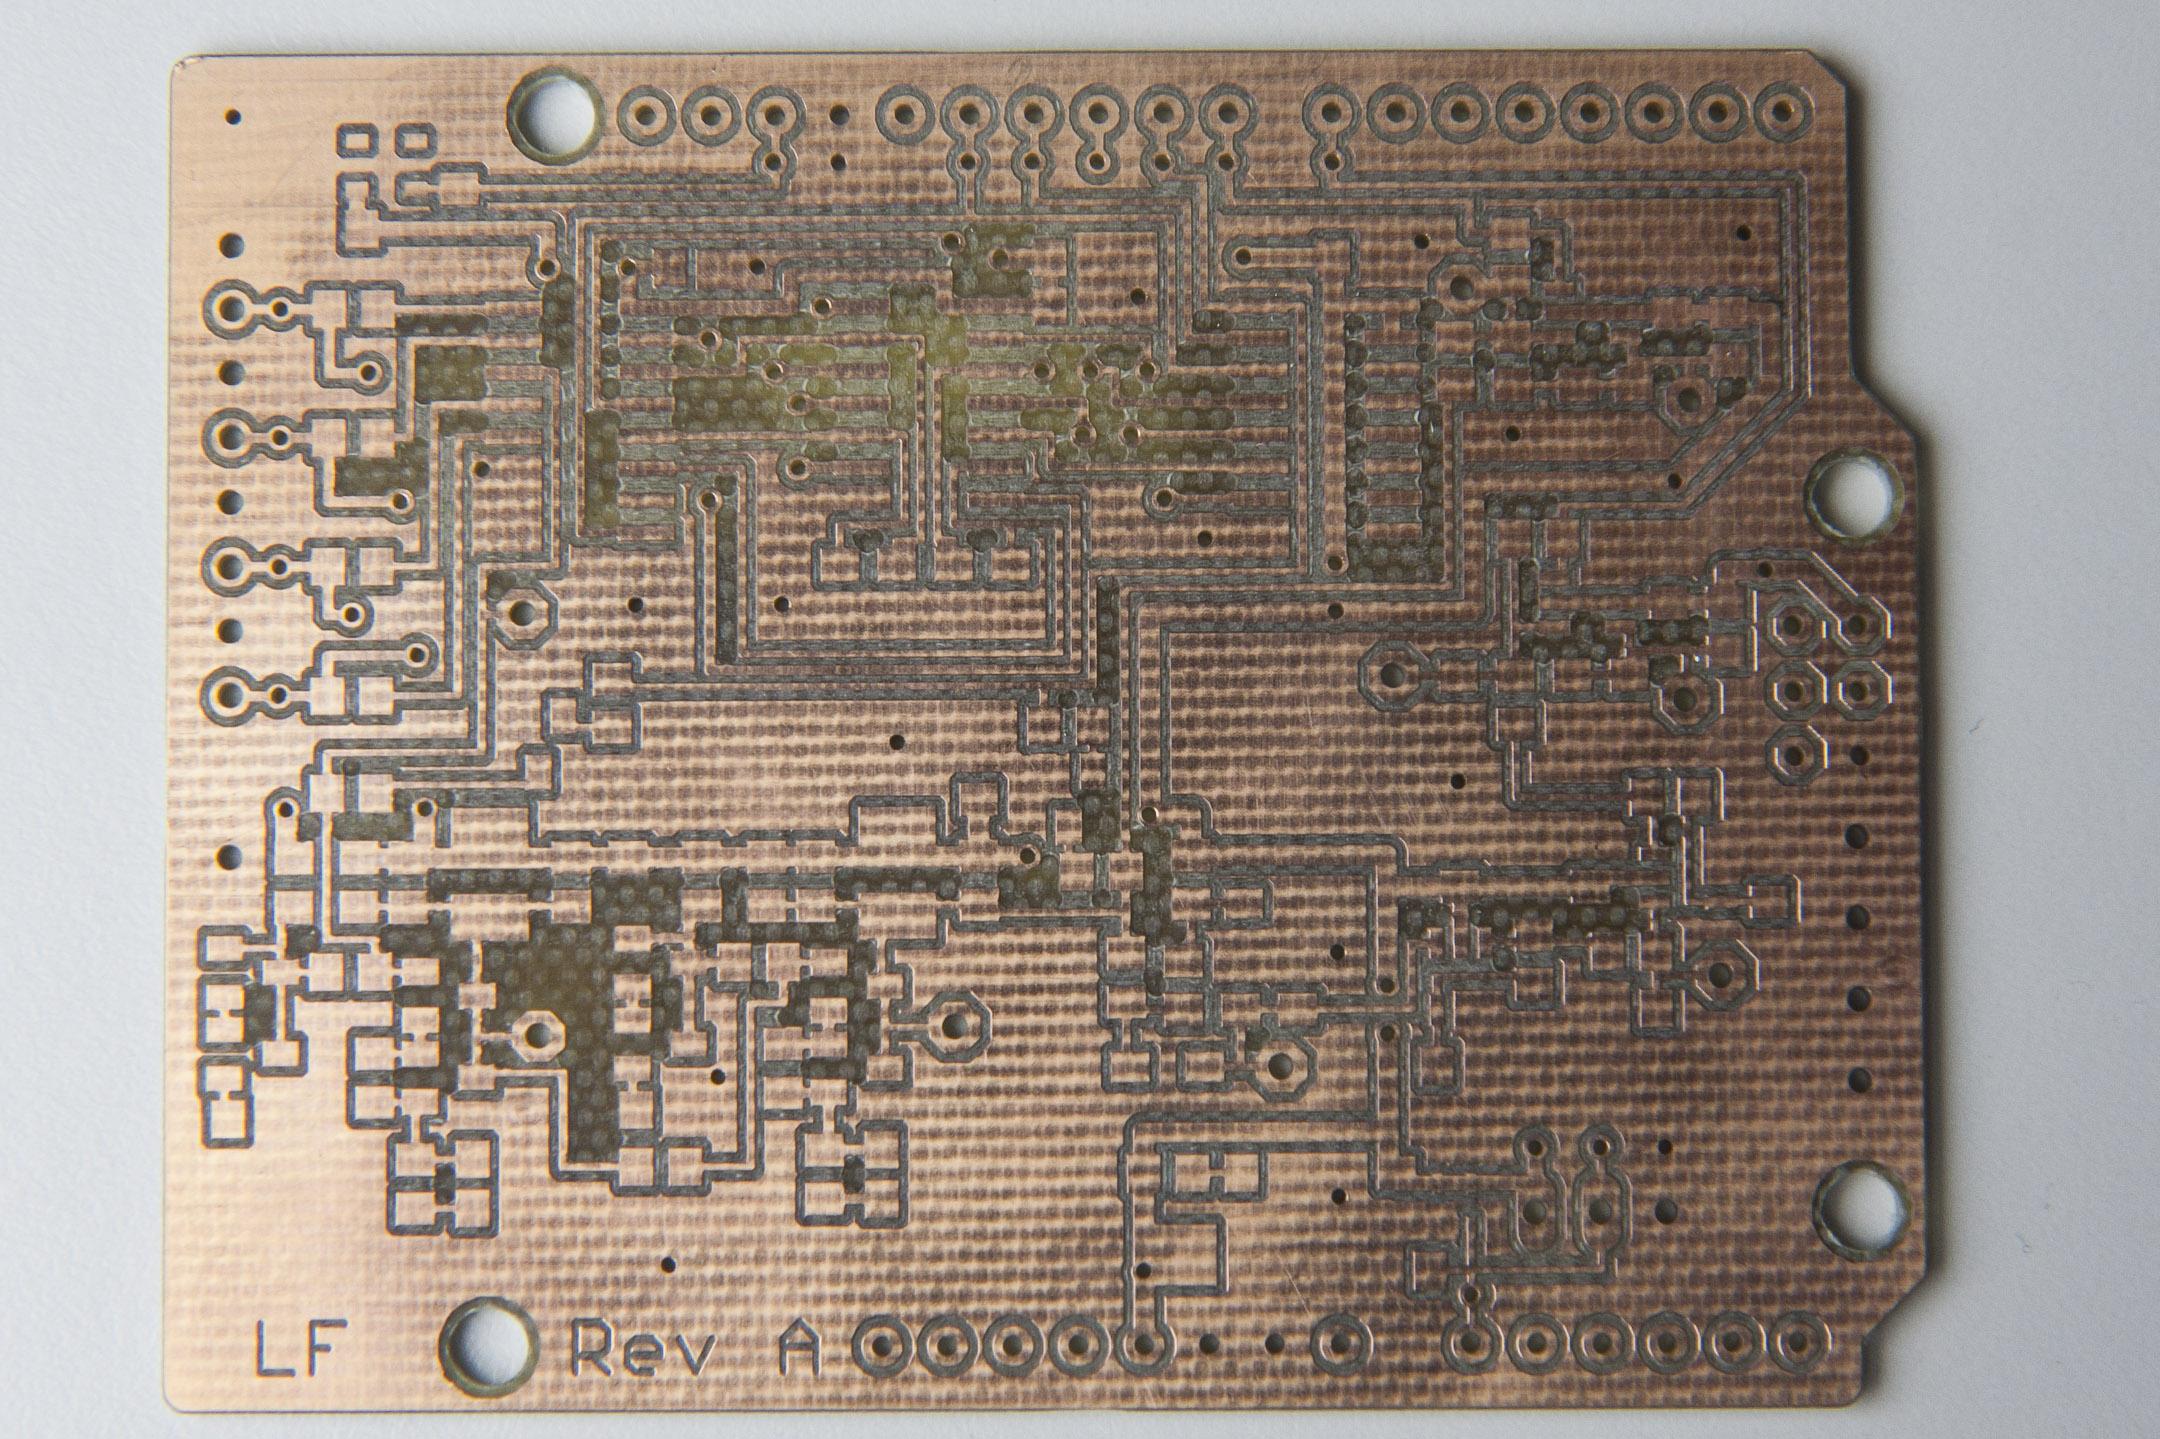 Arduino Uno Soldernerd Page 2 Circuit Medium Power 40khz Ultrasound Transducer Driver Circuits The New Ultrasonic Wind Meter Shield